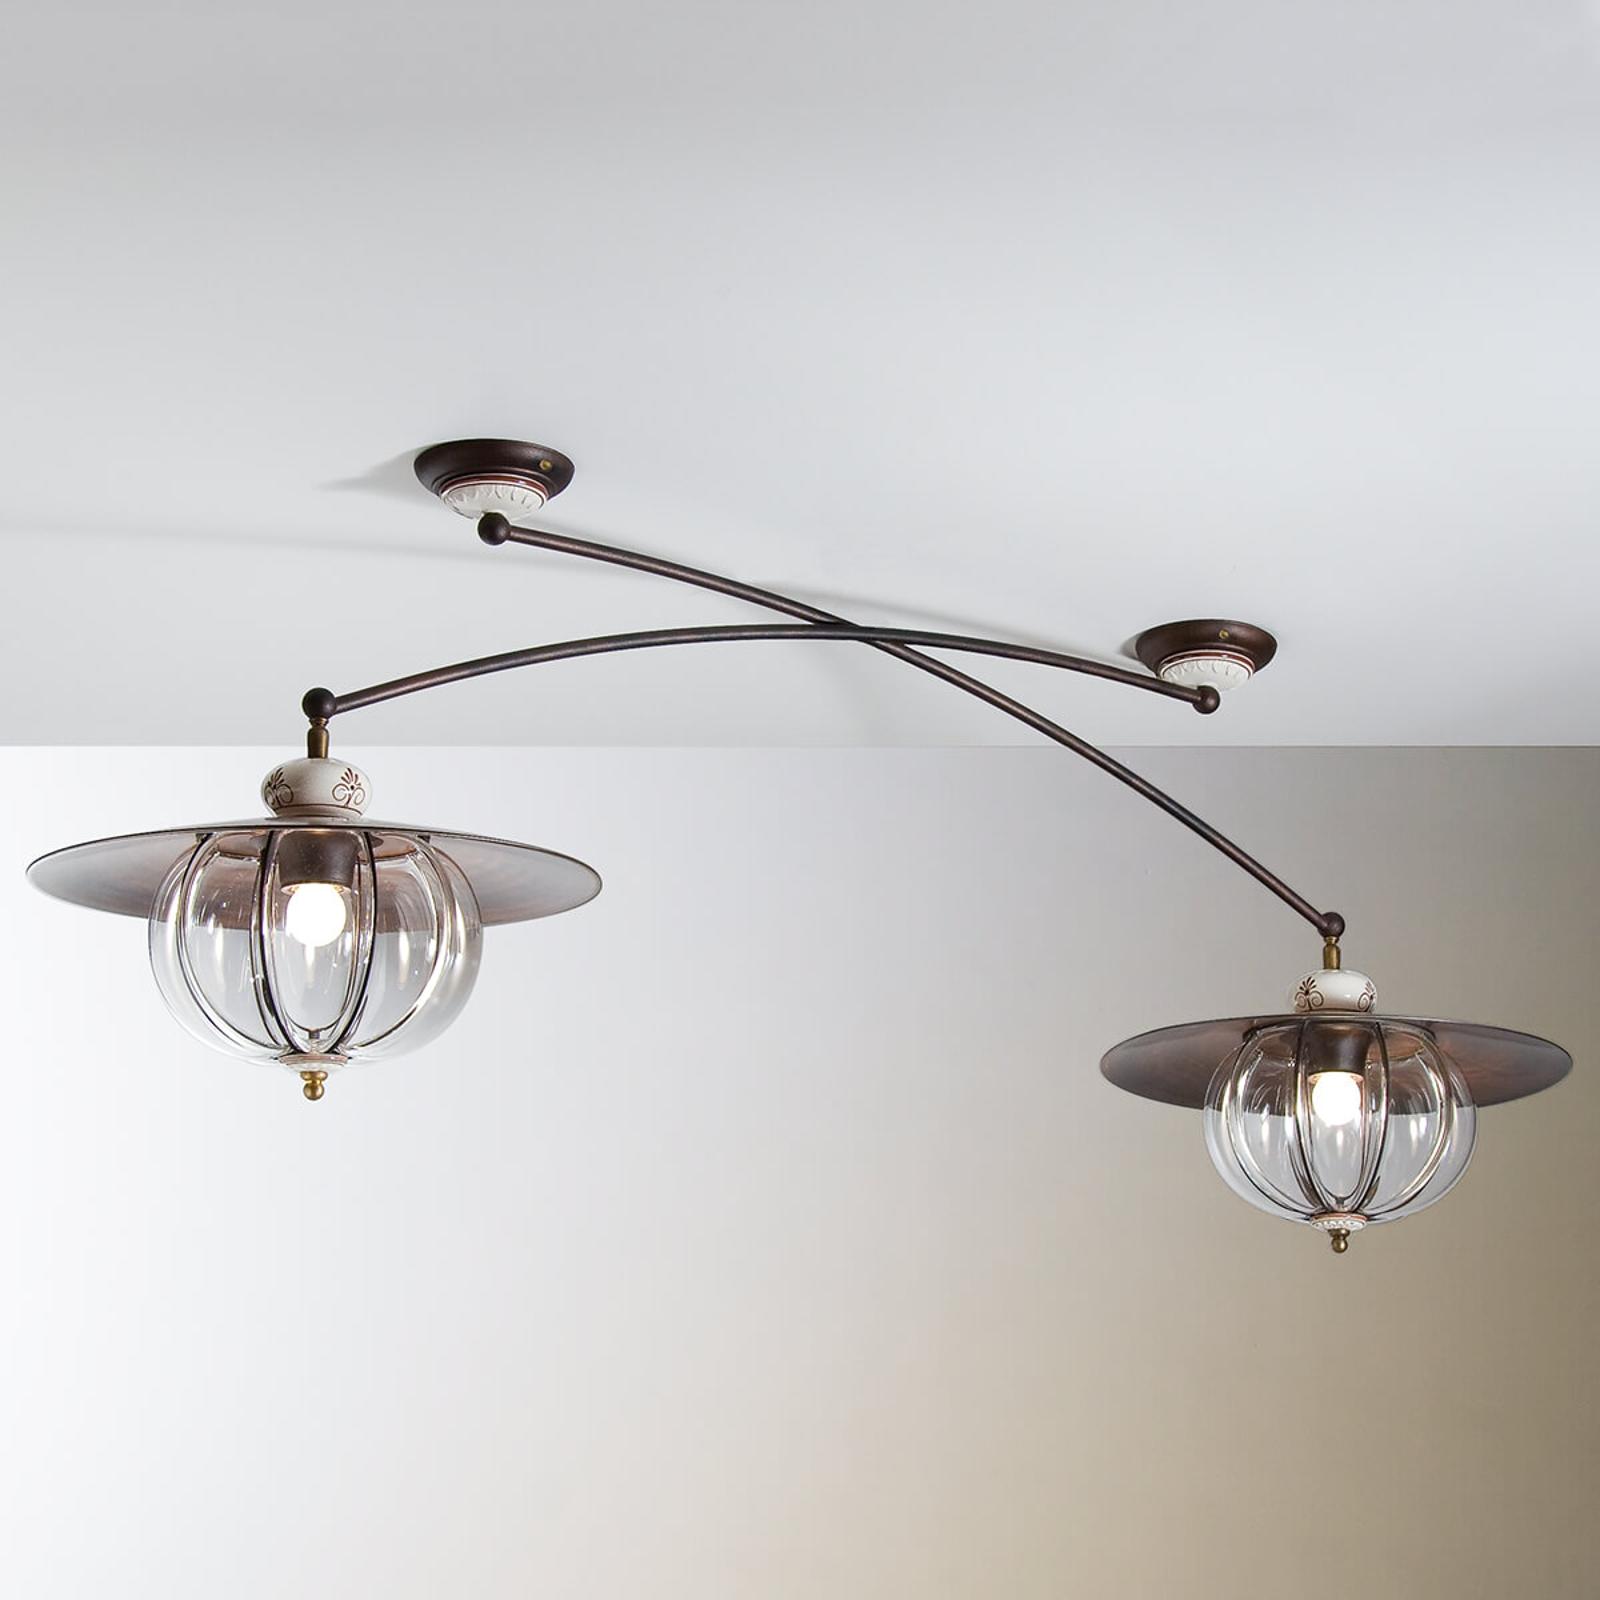 Lampara loftlampe, 2 lyskilder, i landlig stil